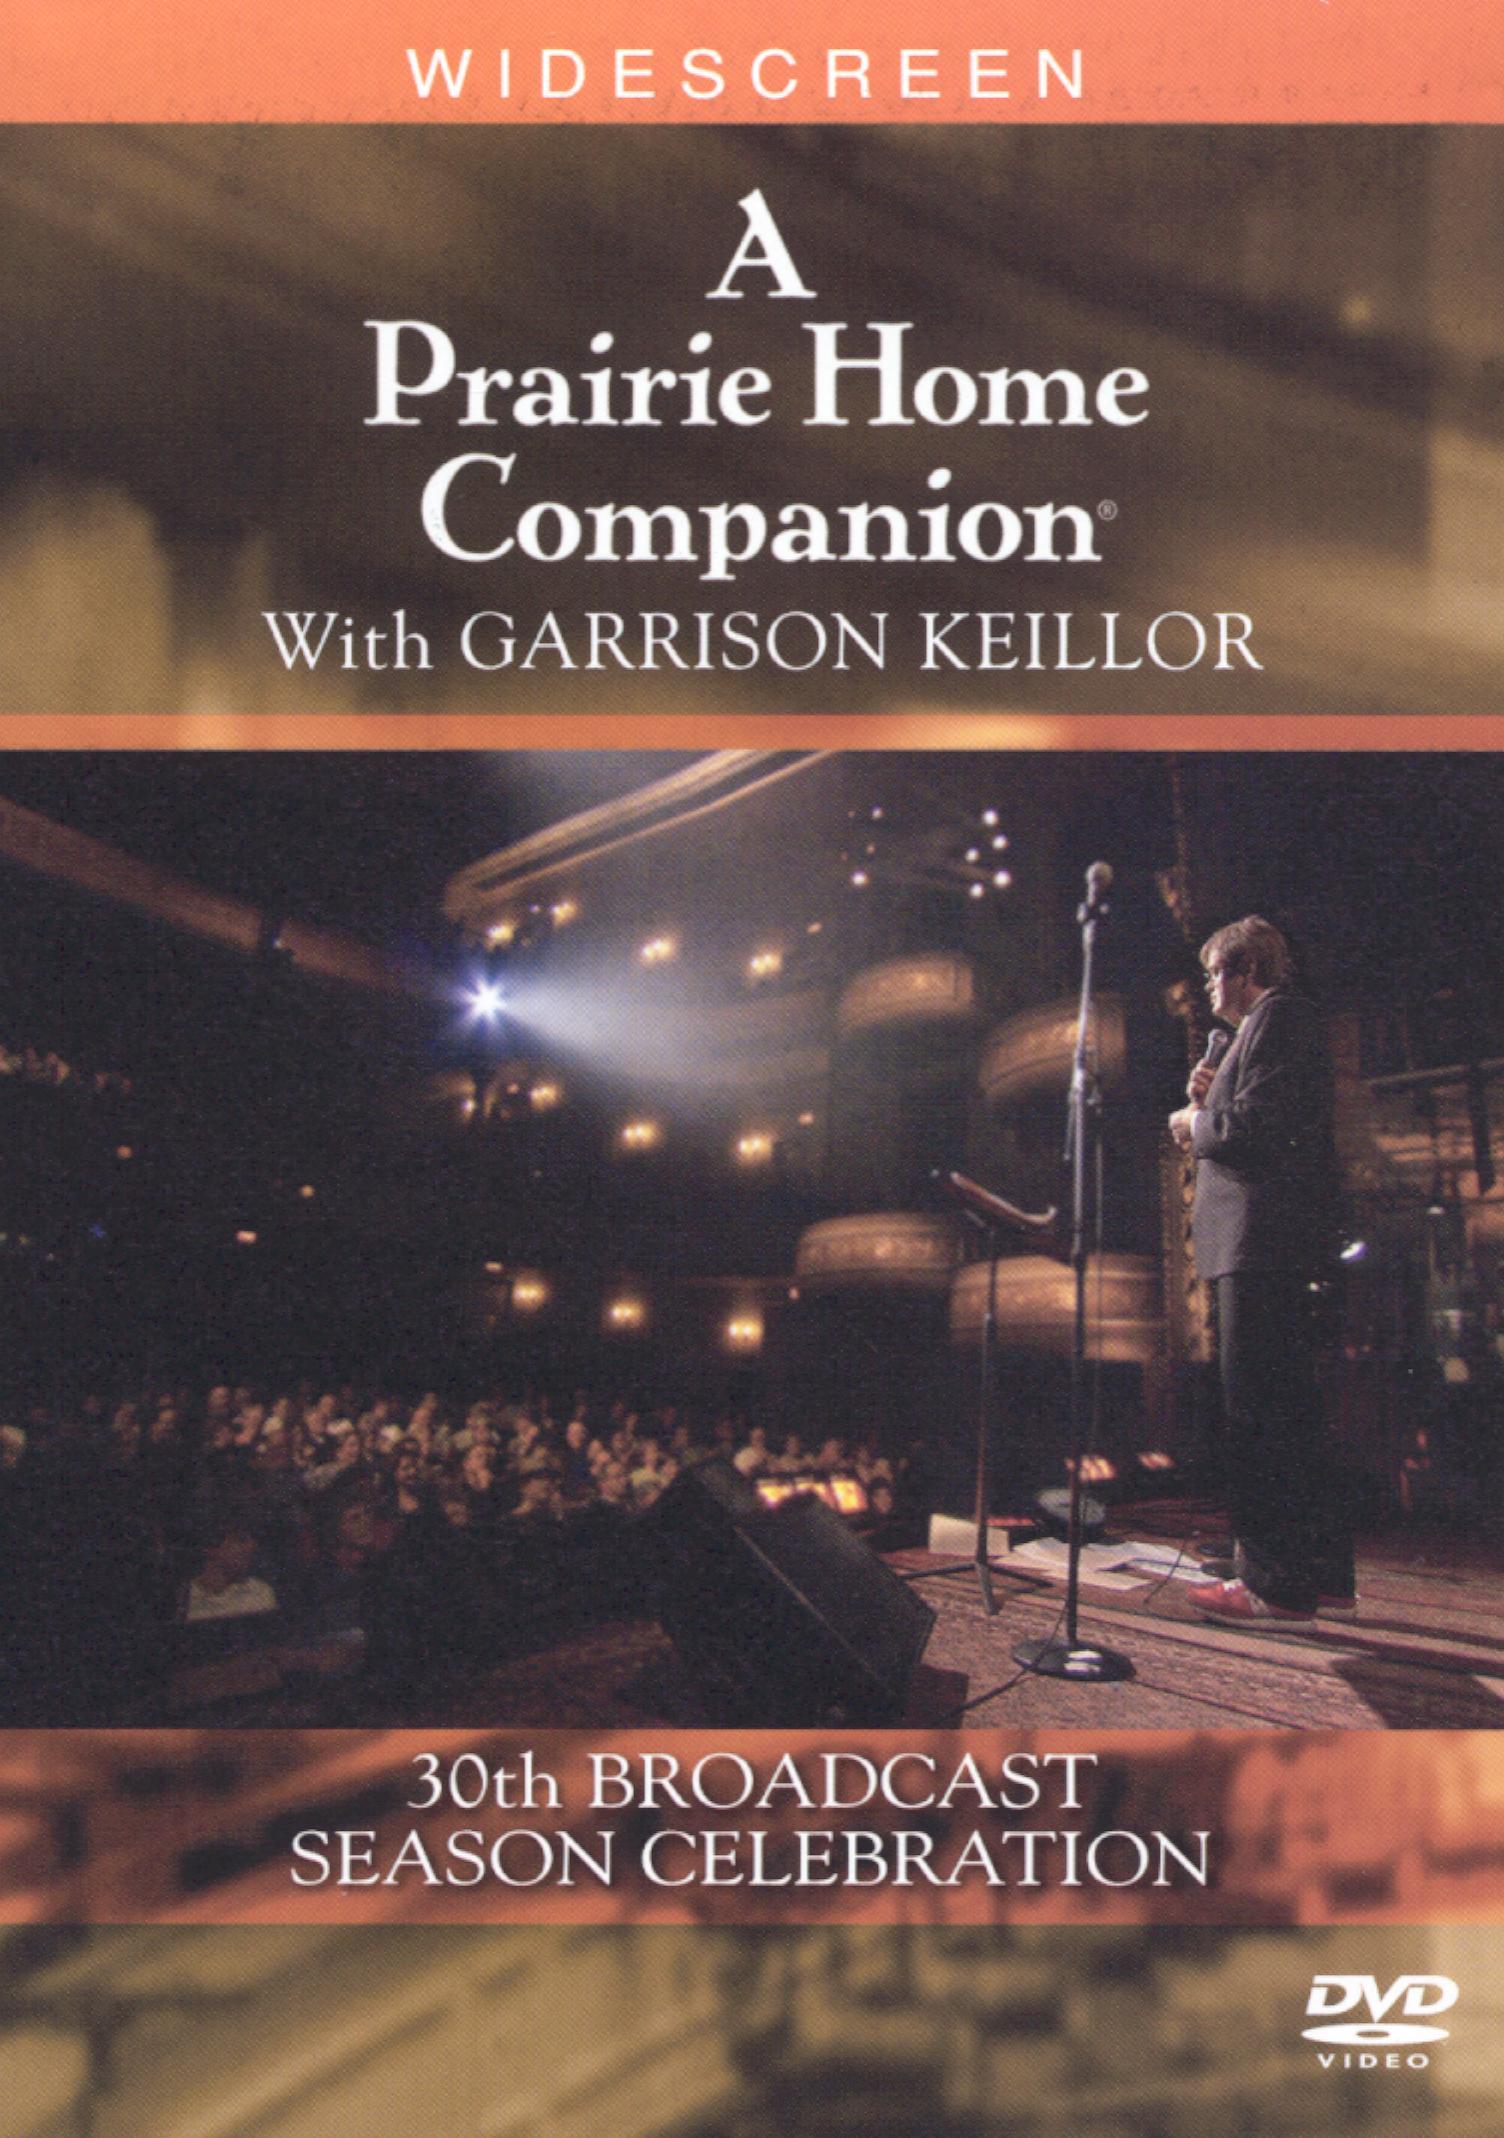 A Prairie Home Companion With Garrison Keillor - 30th Broadcast Season Celebration